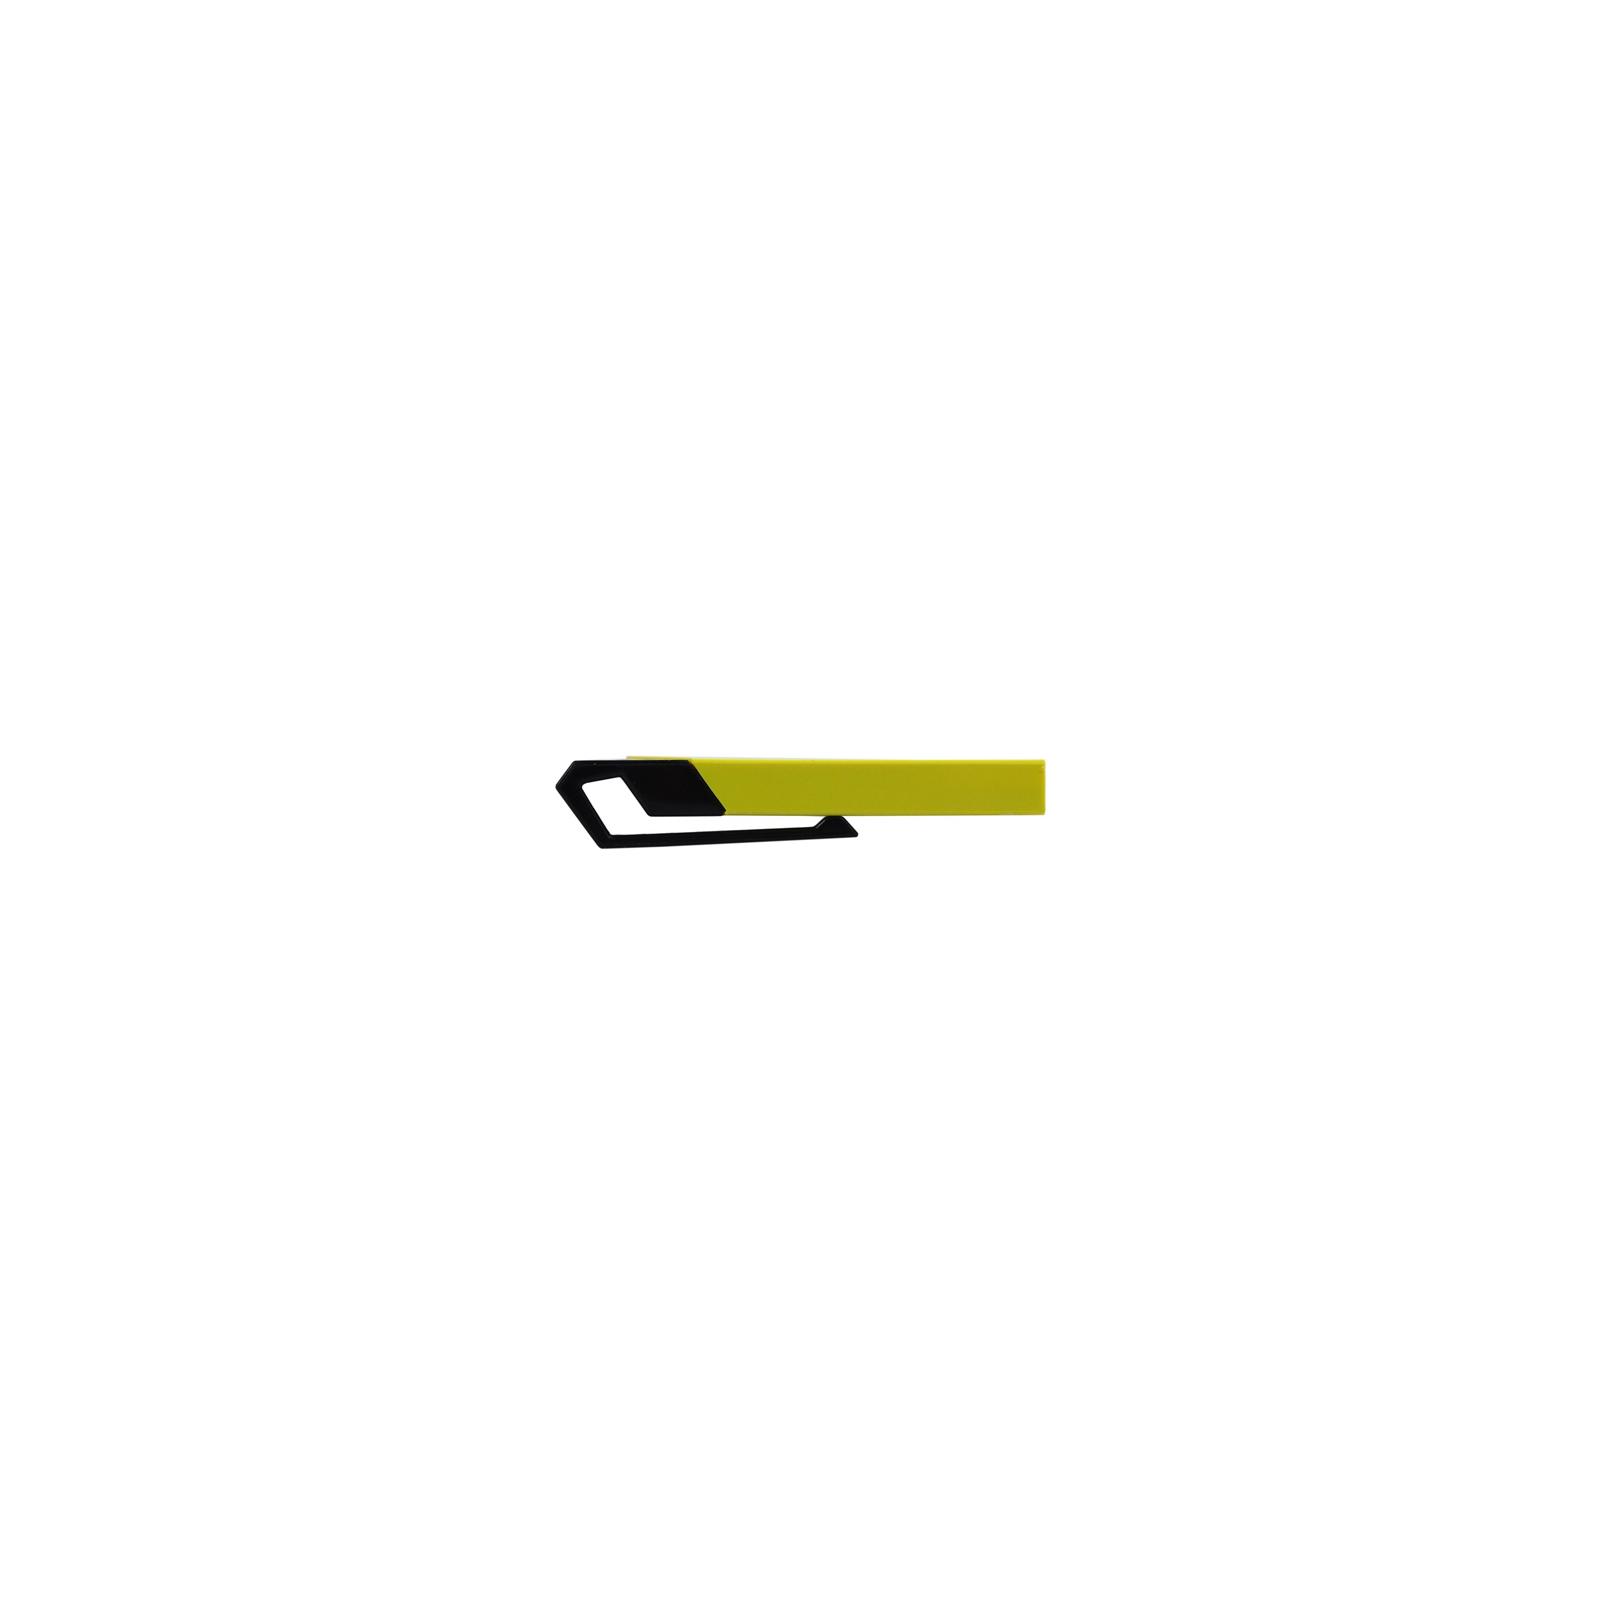 USB флеш накопитель 8GB AH131 Yellow RP USB2.0 Apacer (AP8GAH131Y-1) изображение 3